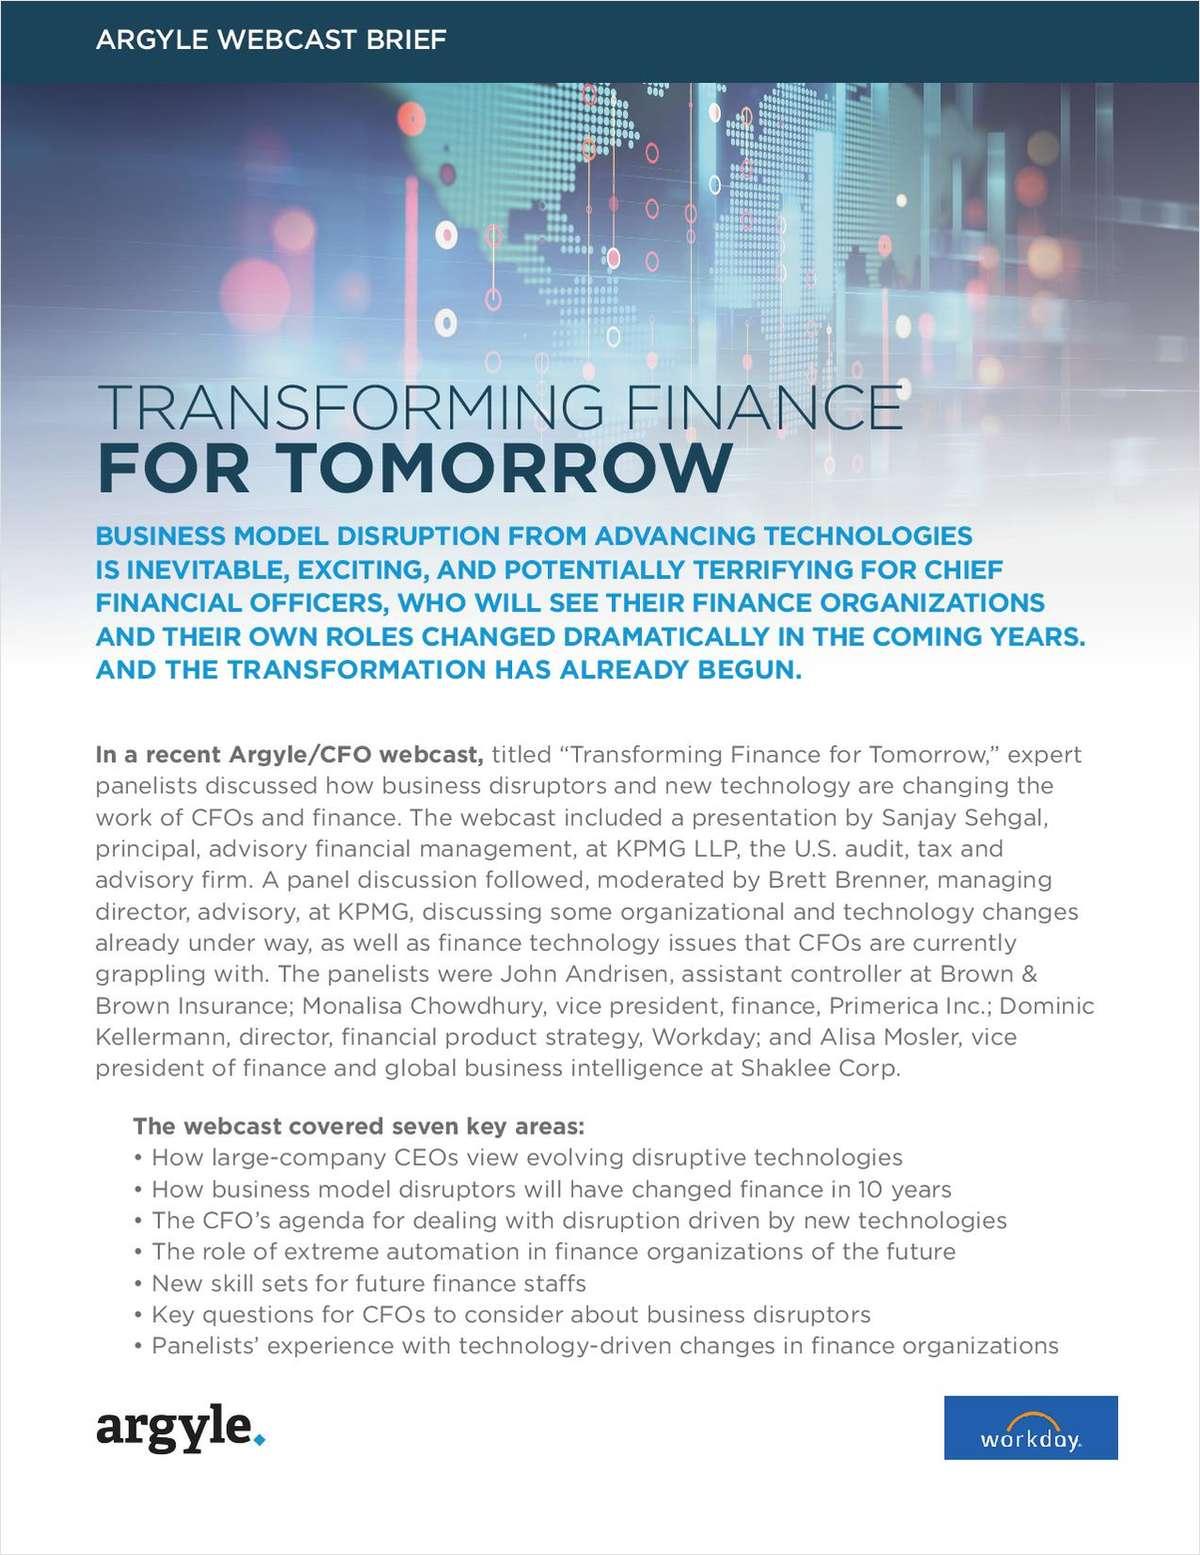 Transforming Finance For Tomorrow Webcast Brief